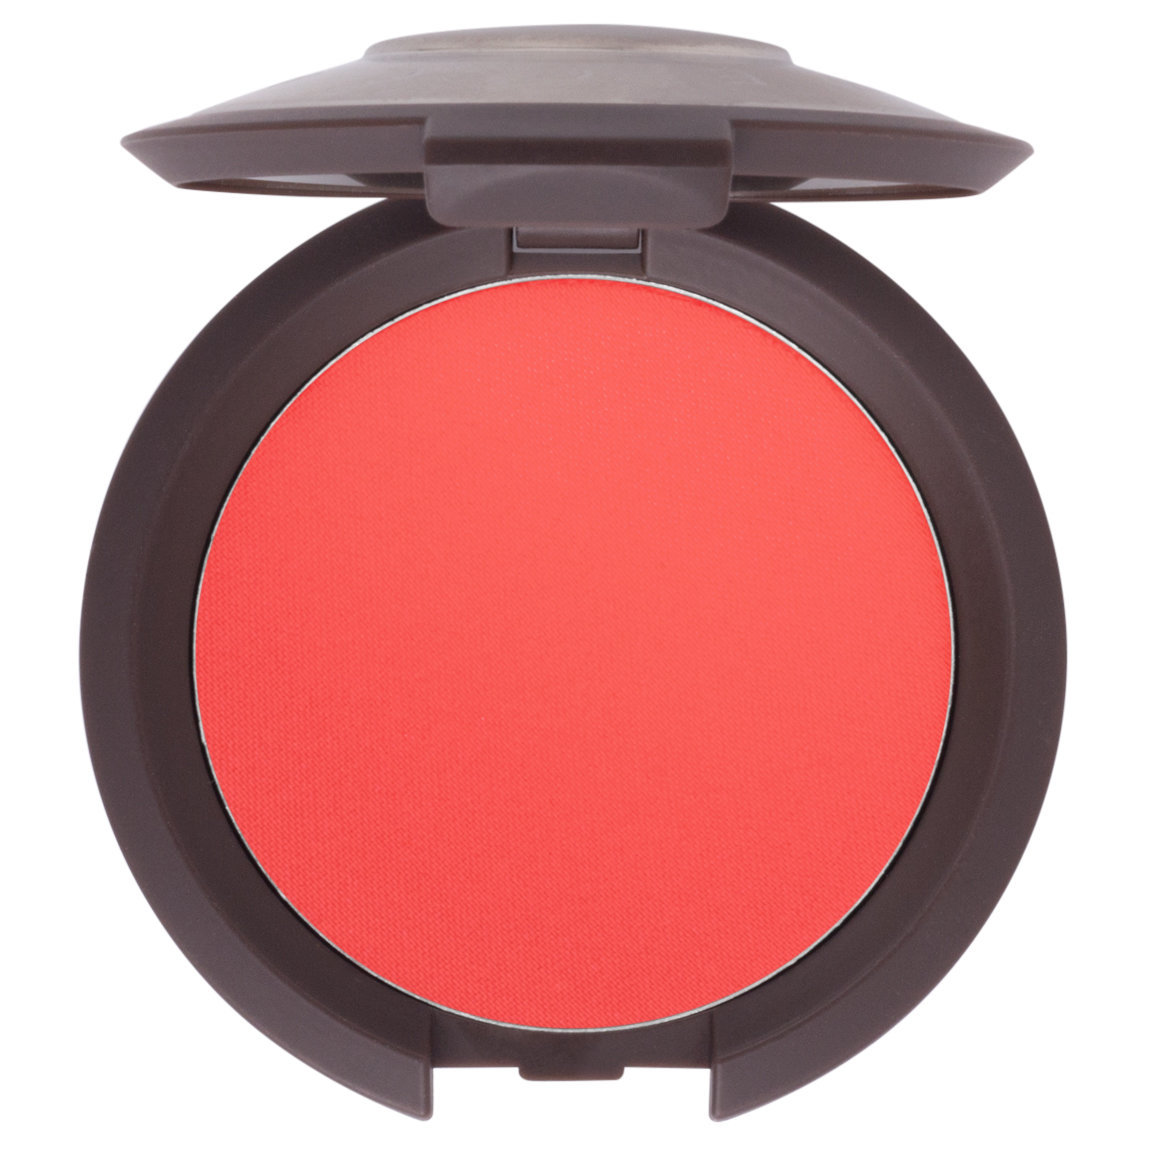 BECCA Cosmetics Mineral Blush Lantana product swatch.